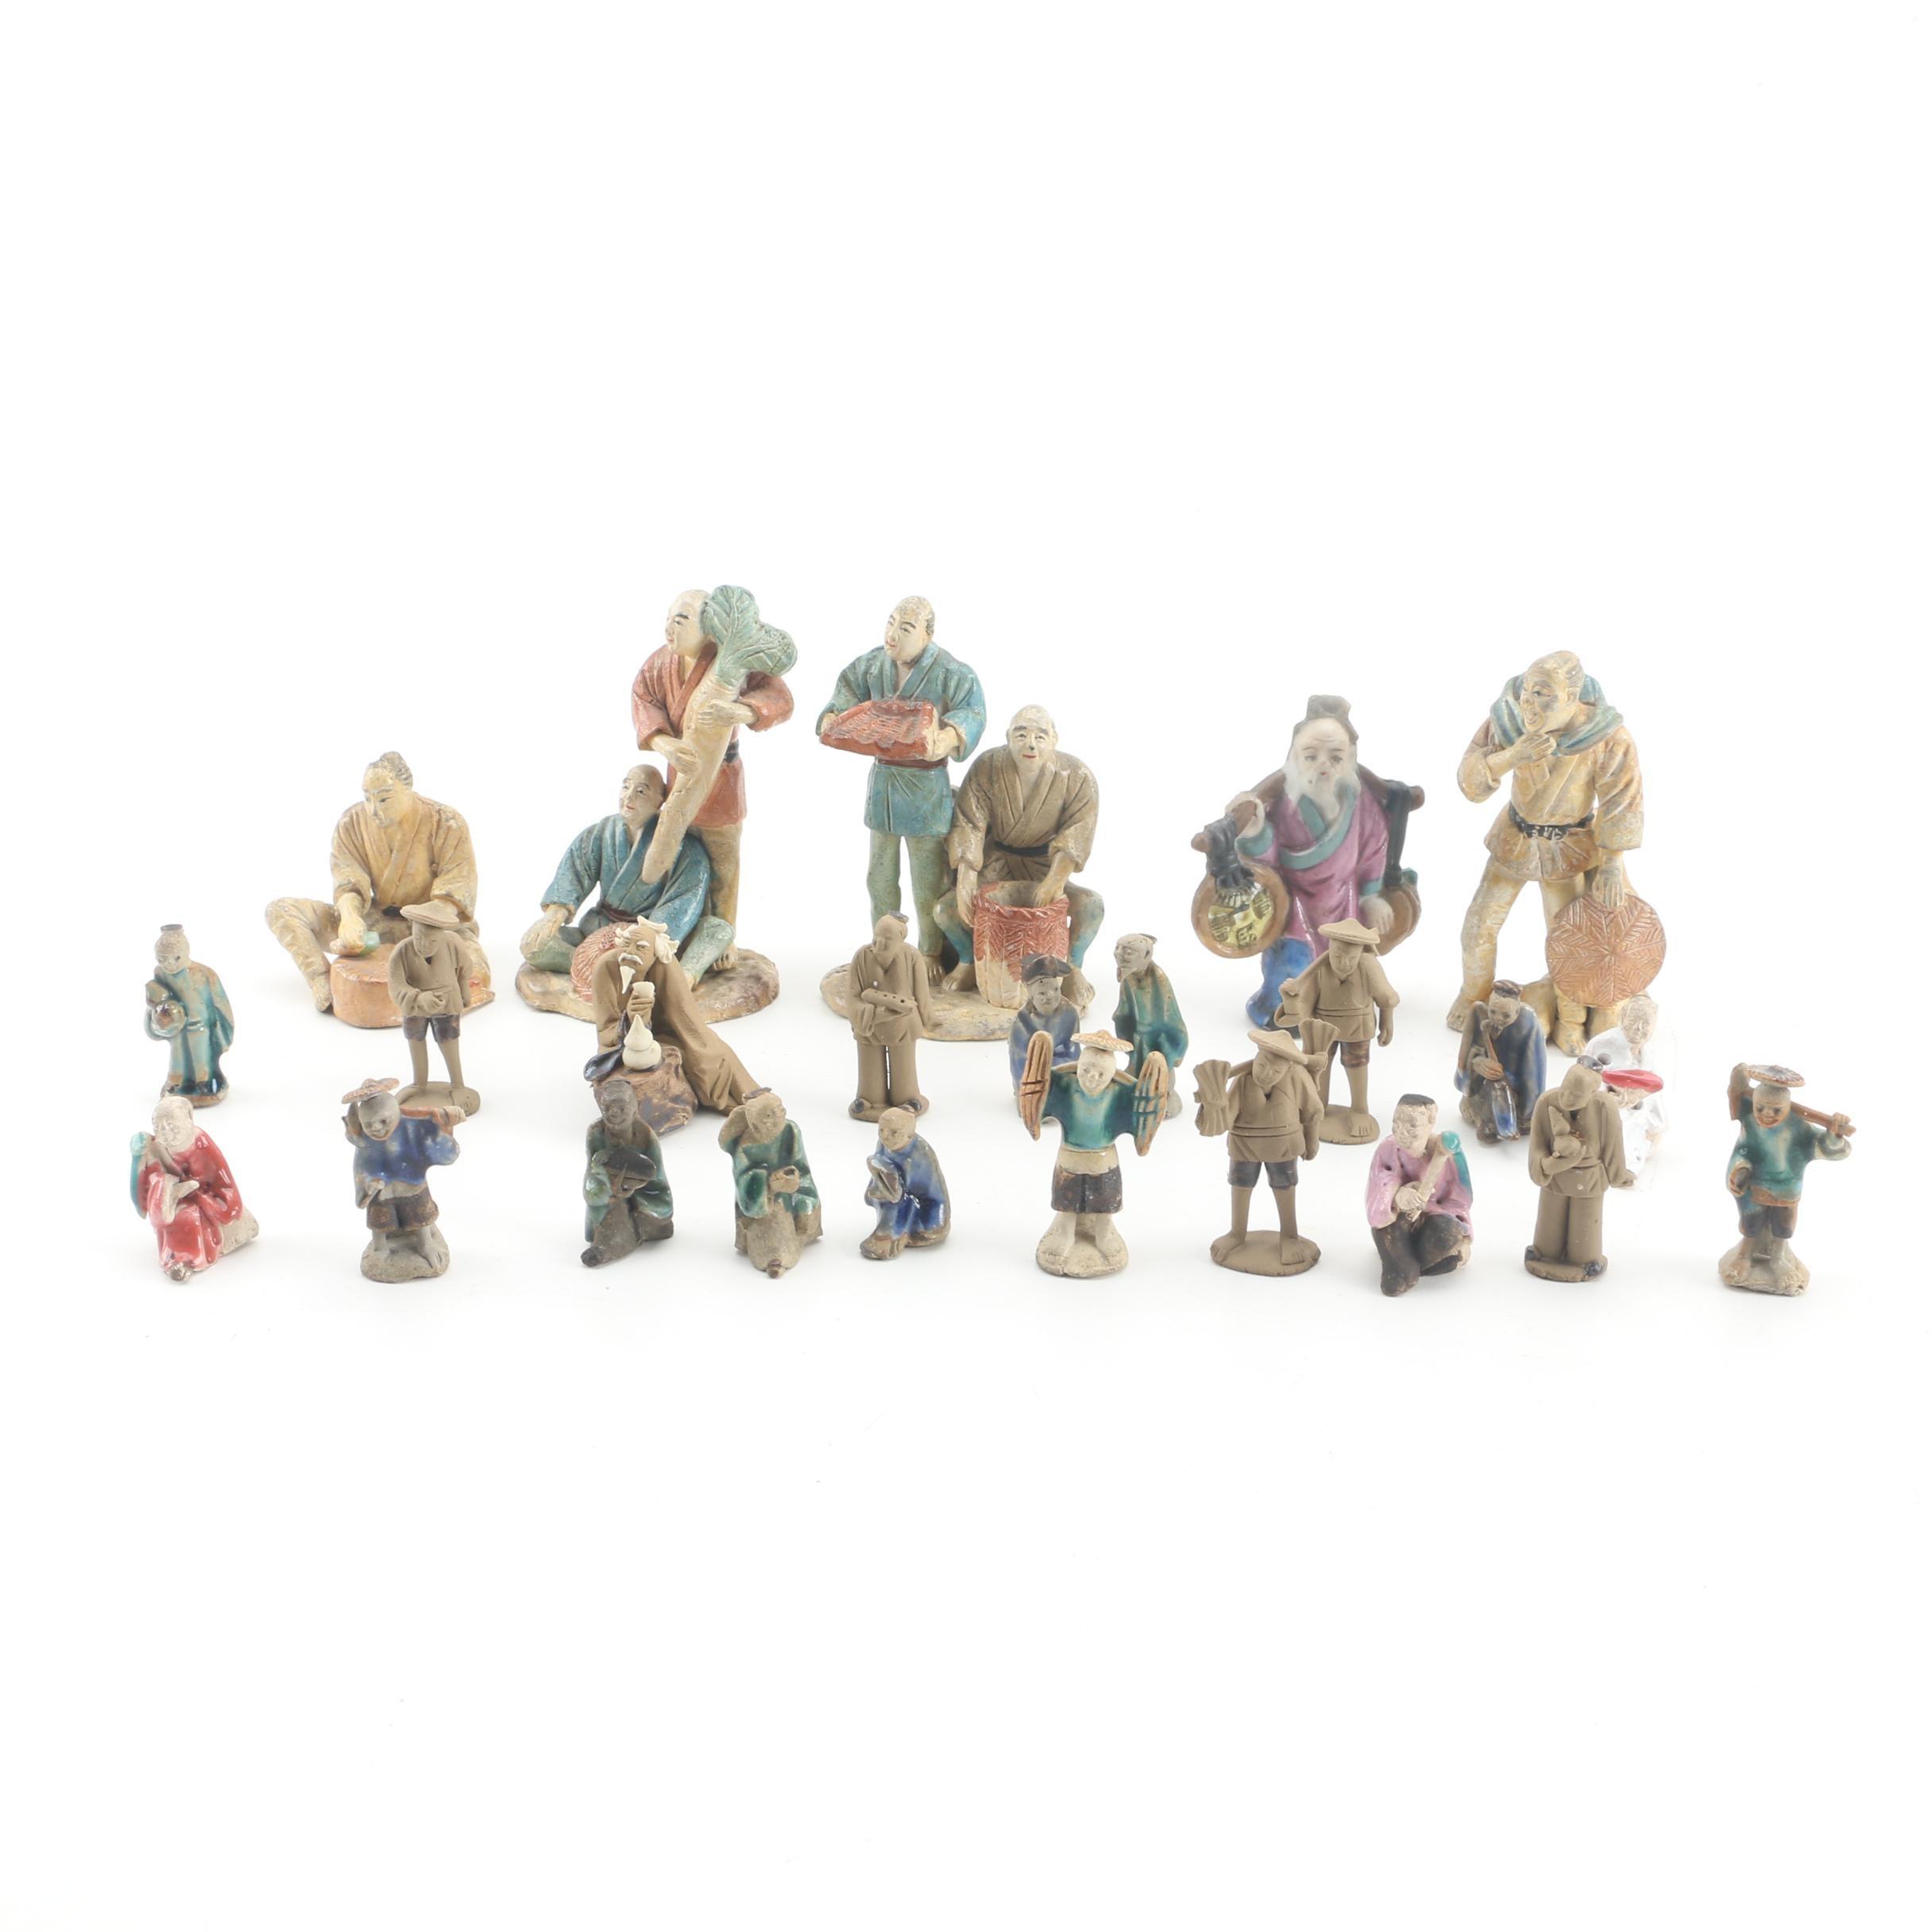 Chinese Miniature Shiwan Ware Figurines